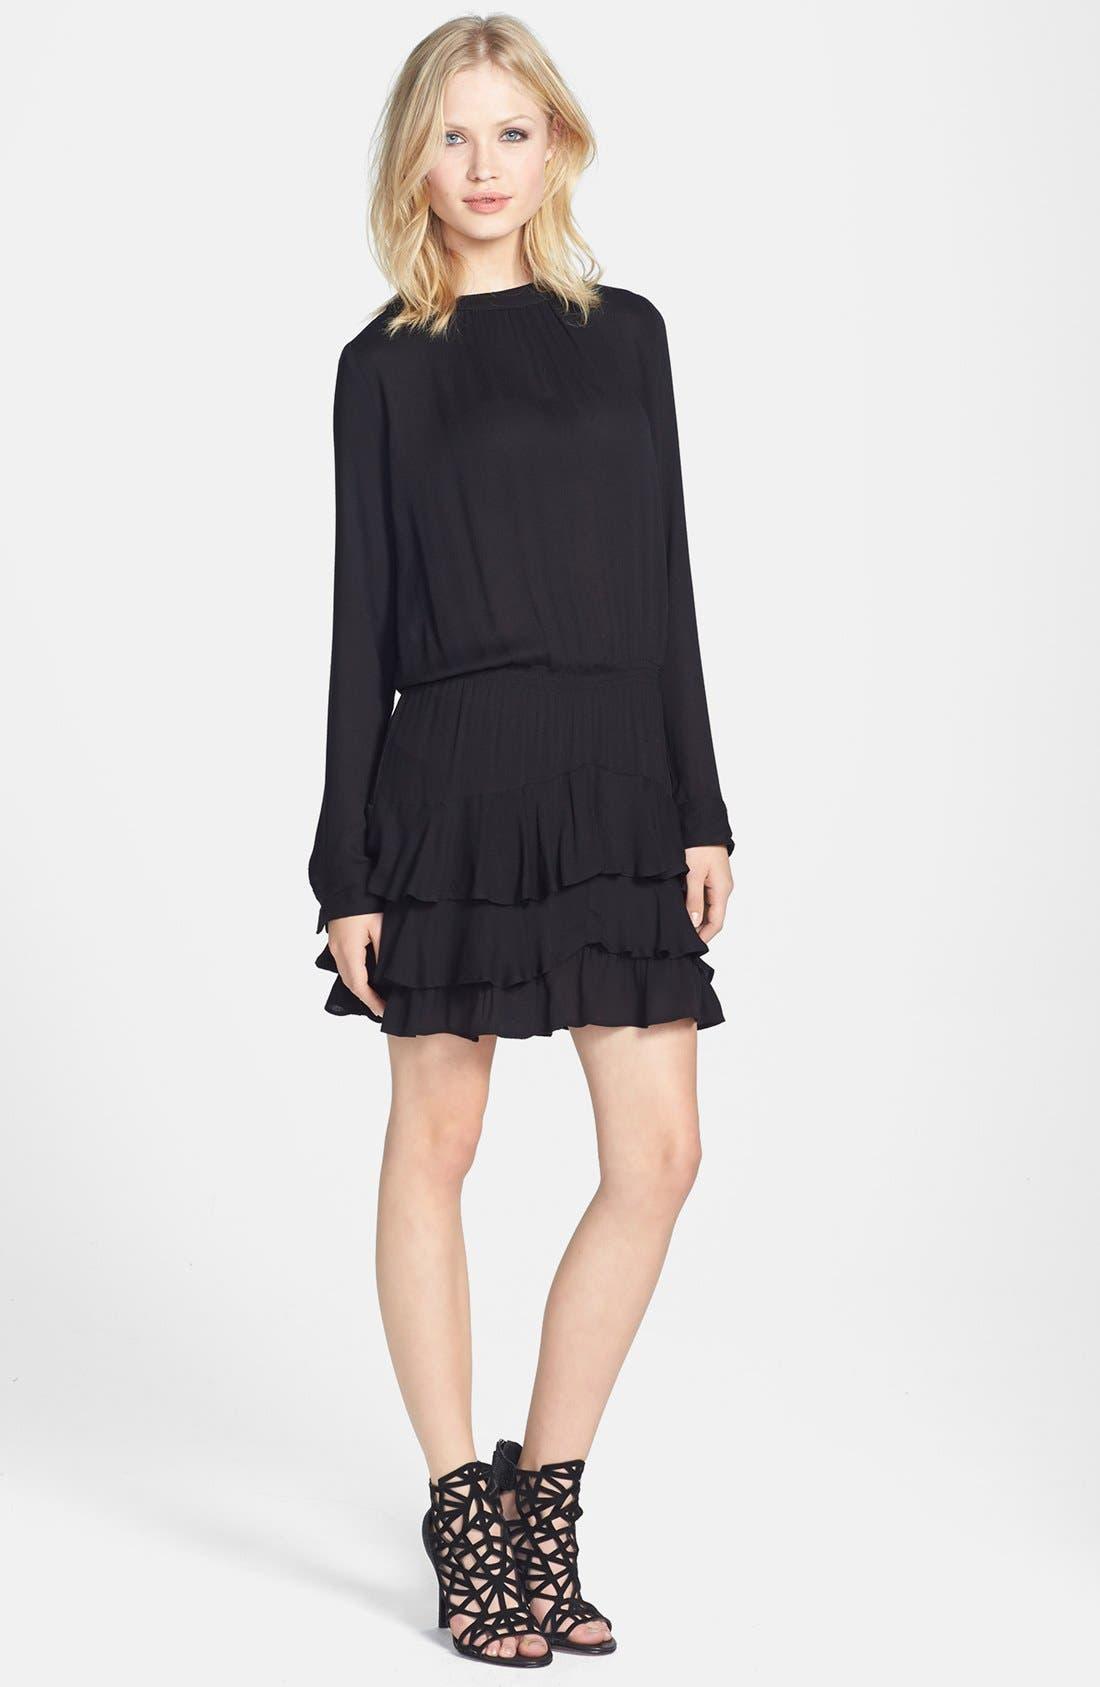 Alternate Image 1 Selected - Ella Moss 'Stella' Ruffle Hem Dress